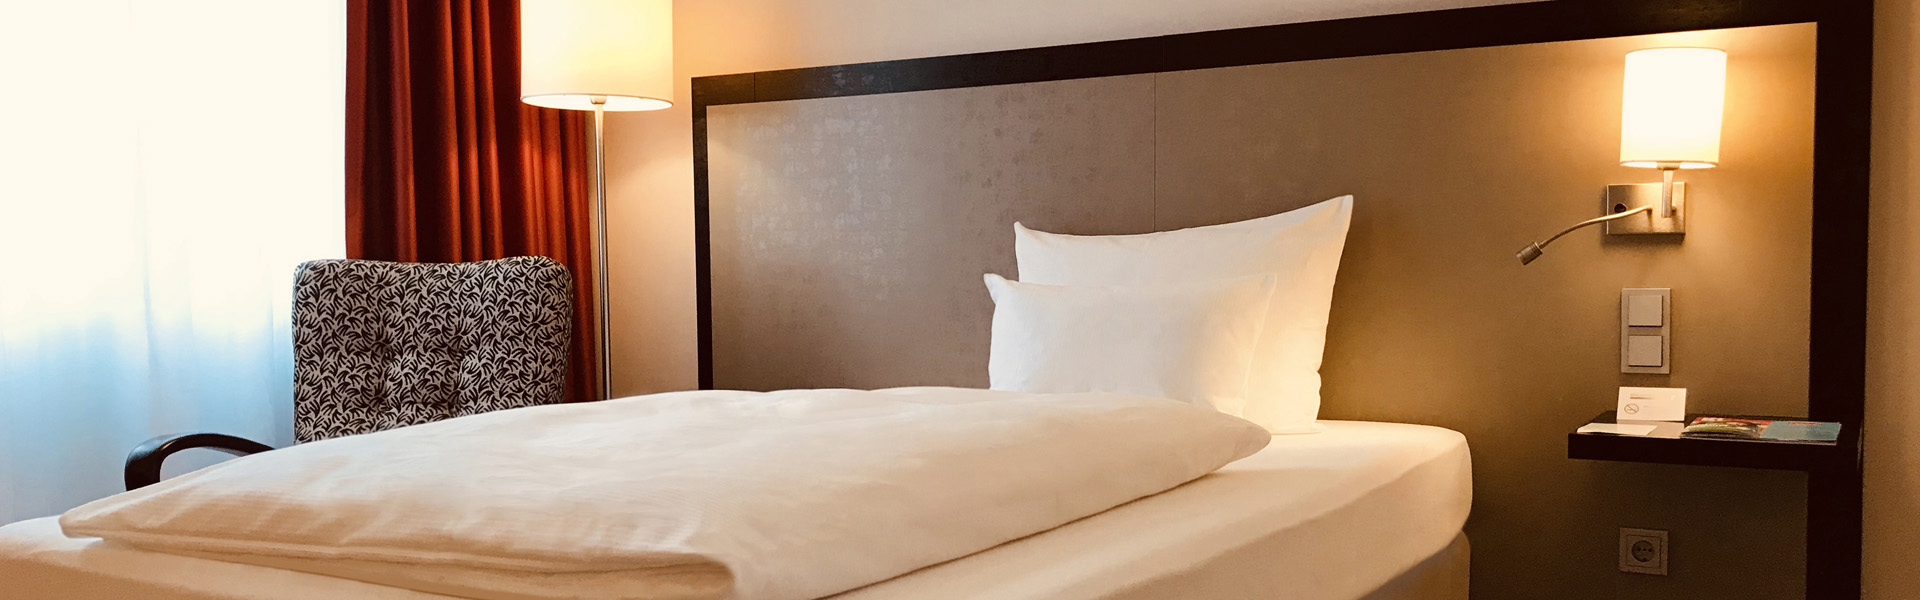 Economy Zimmer Bett Bielefeld Hotel Bielefelder Hof